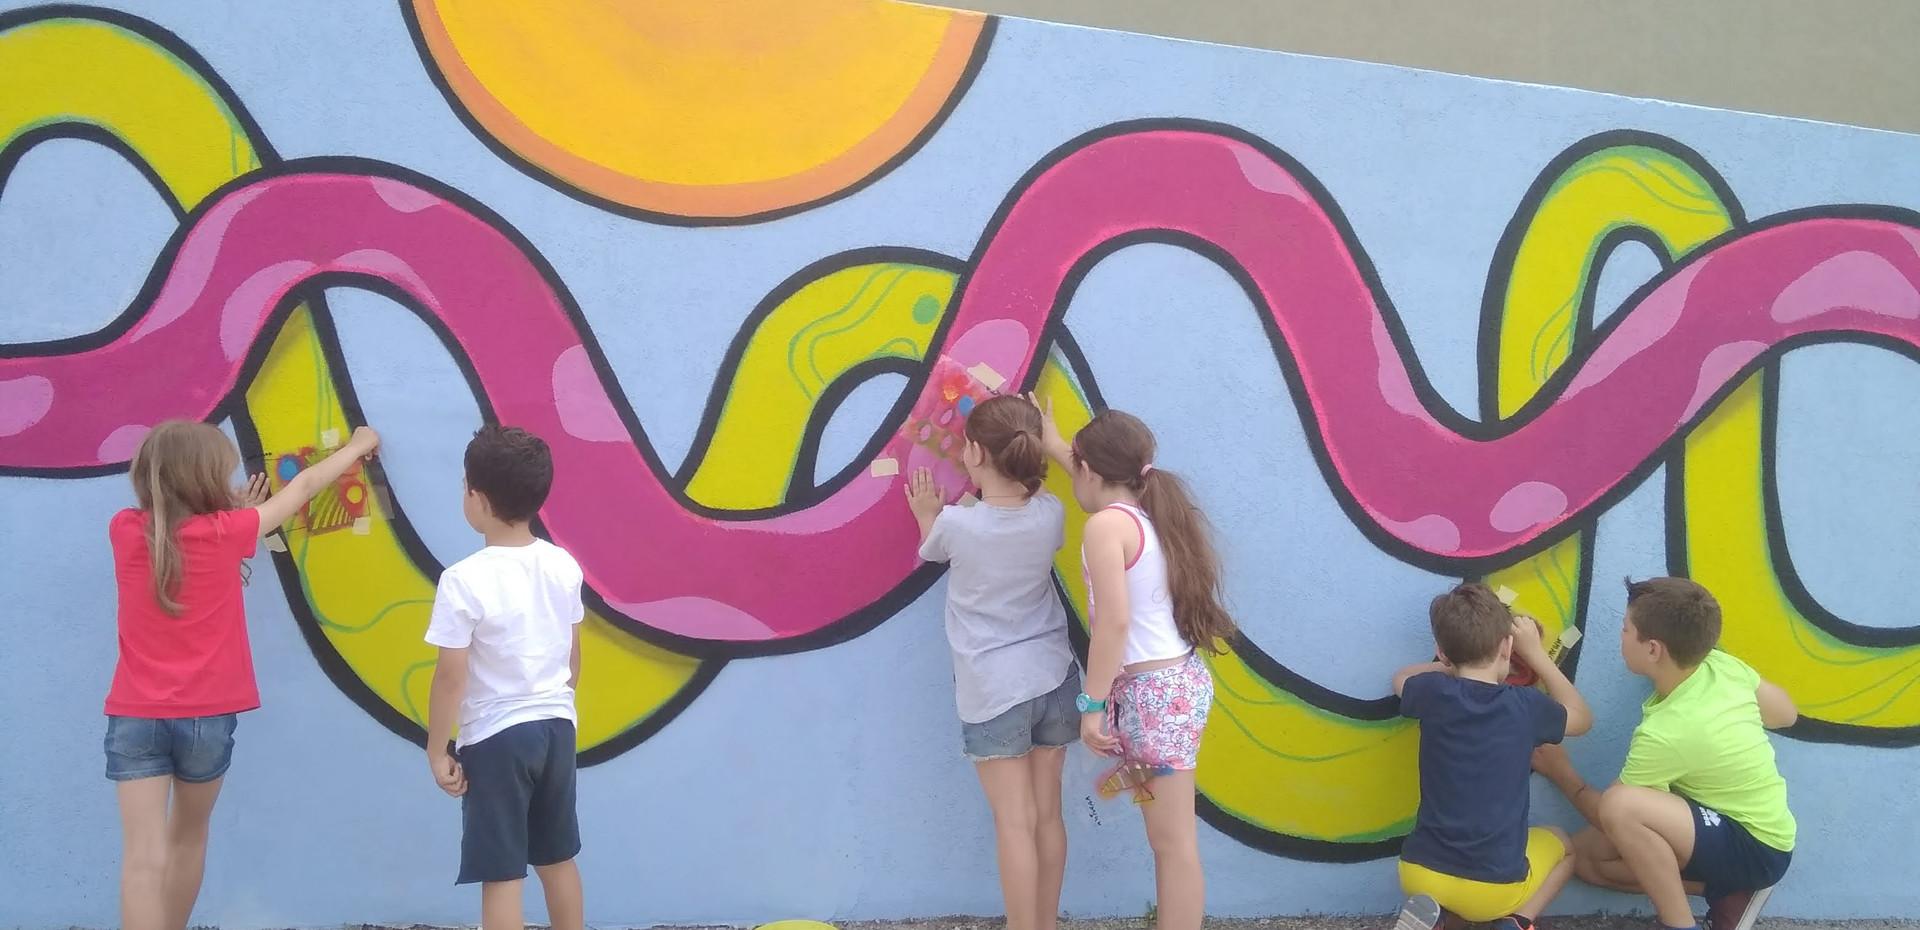 STREET ART 4 young